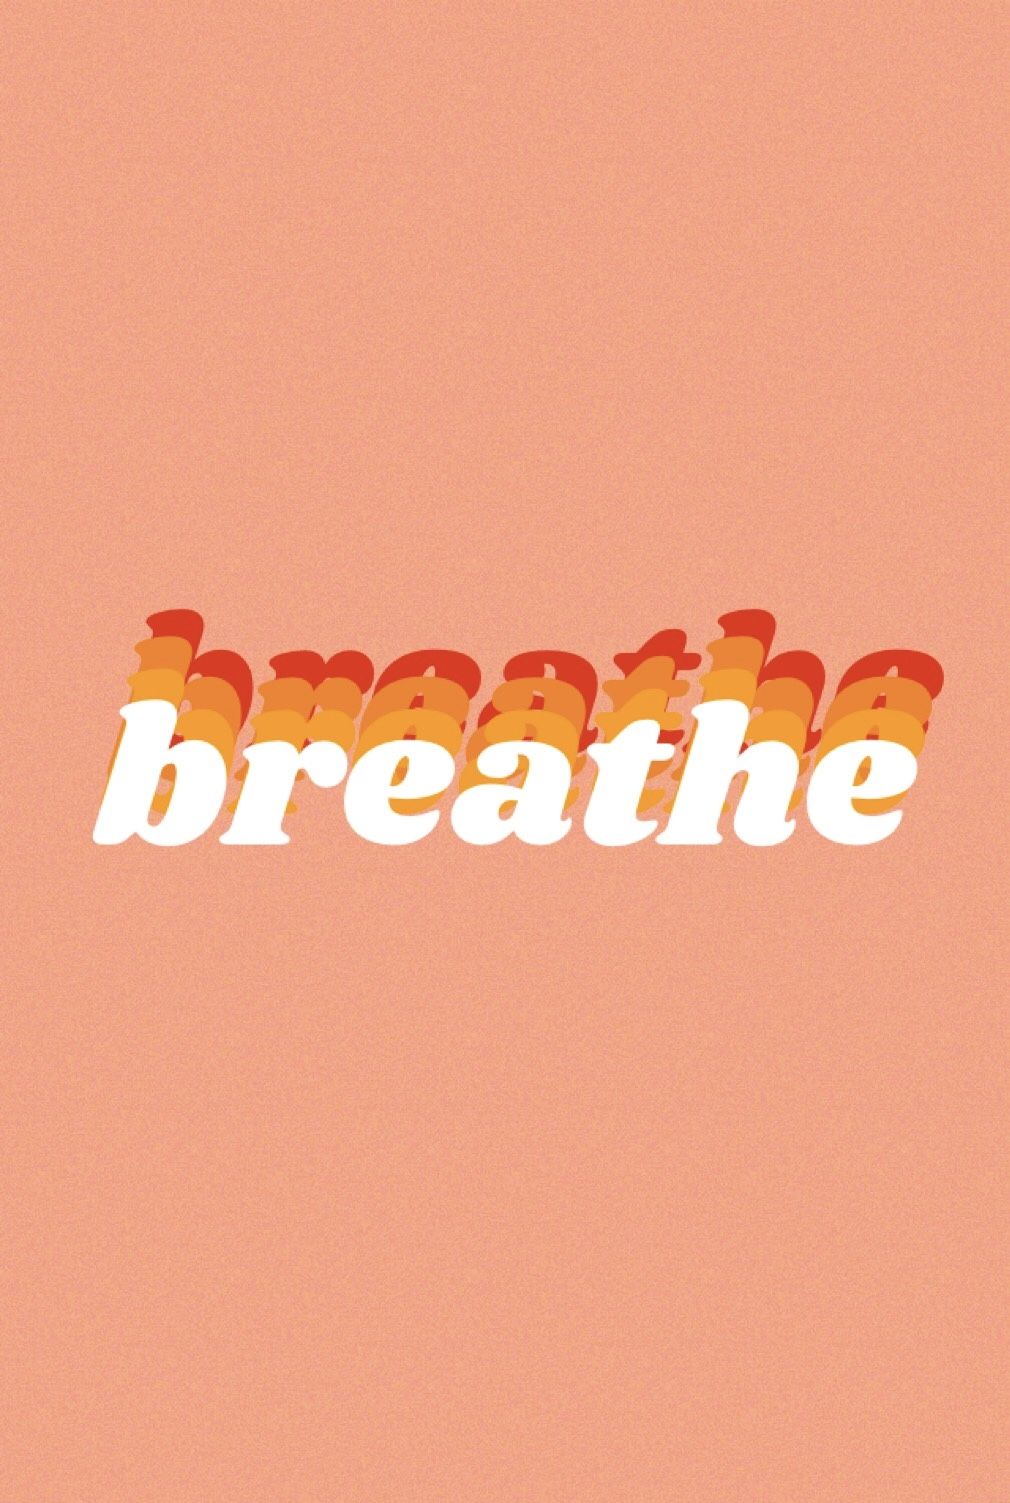 Breathe Motivational Quote